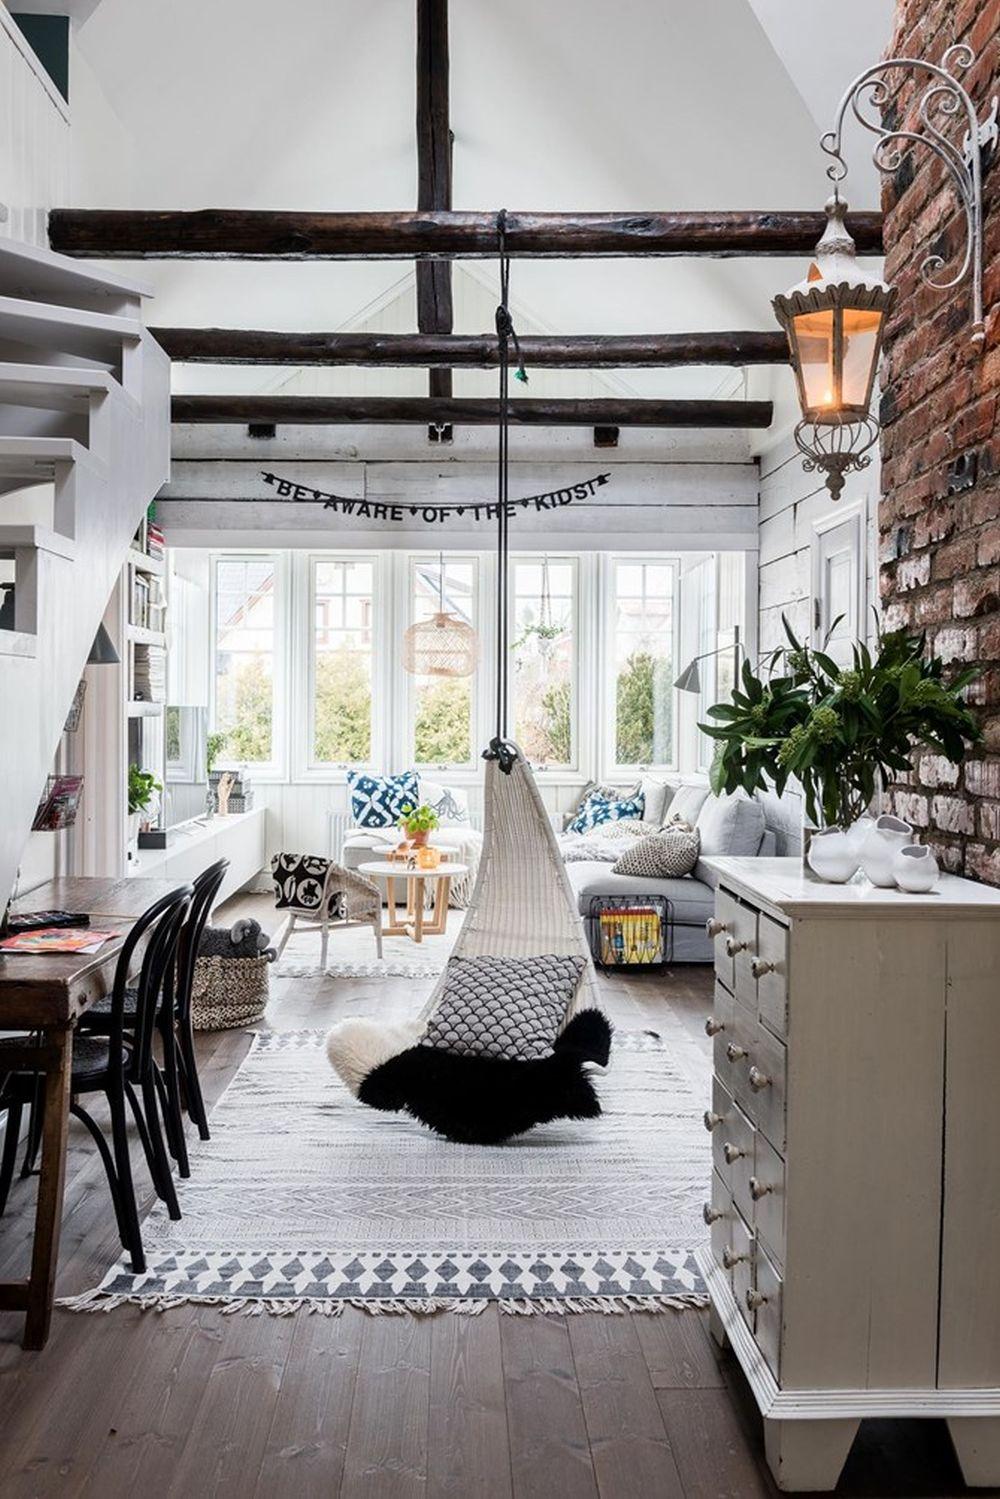 adelaparvu.com despre casa in stil scandinav, Foto Lundin, Christian Johansson (25)